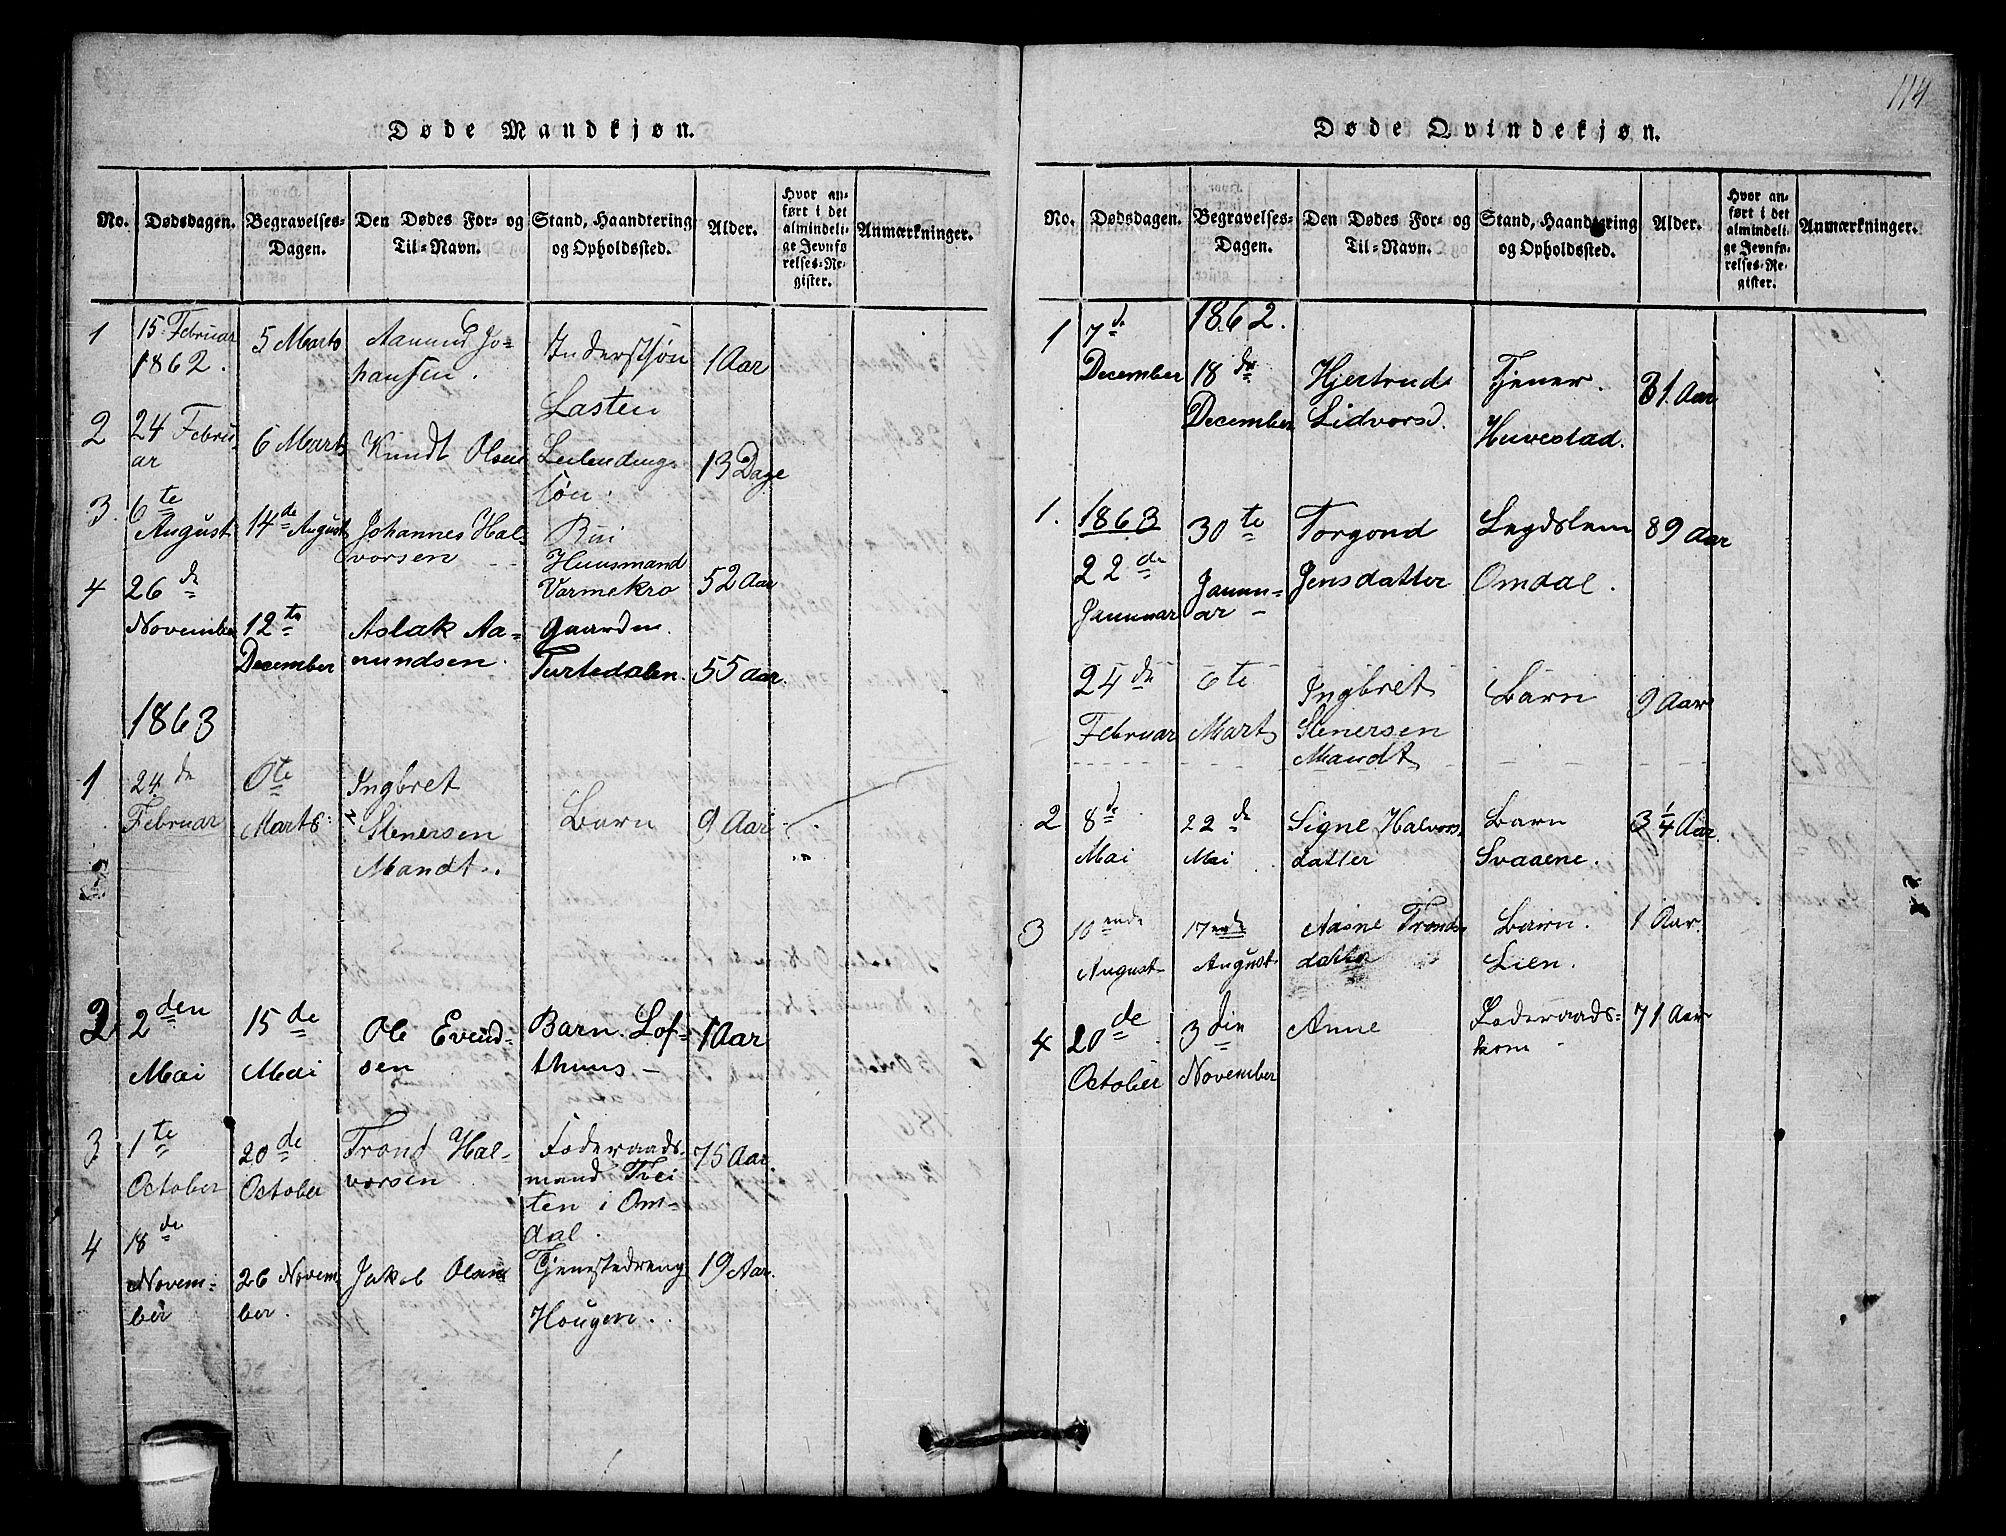 SAKO, Lårdal kirkebøker, G/Gb/L0001: Klokkerbok nr. II 1, 1815-1865, s. 114